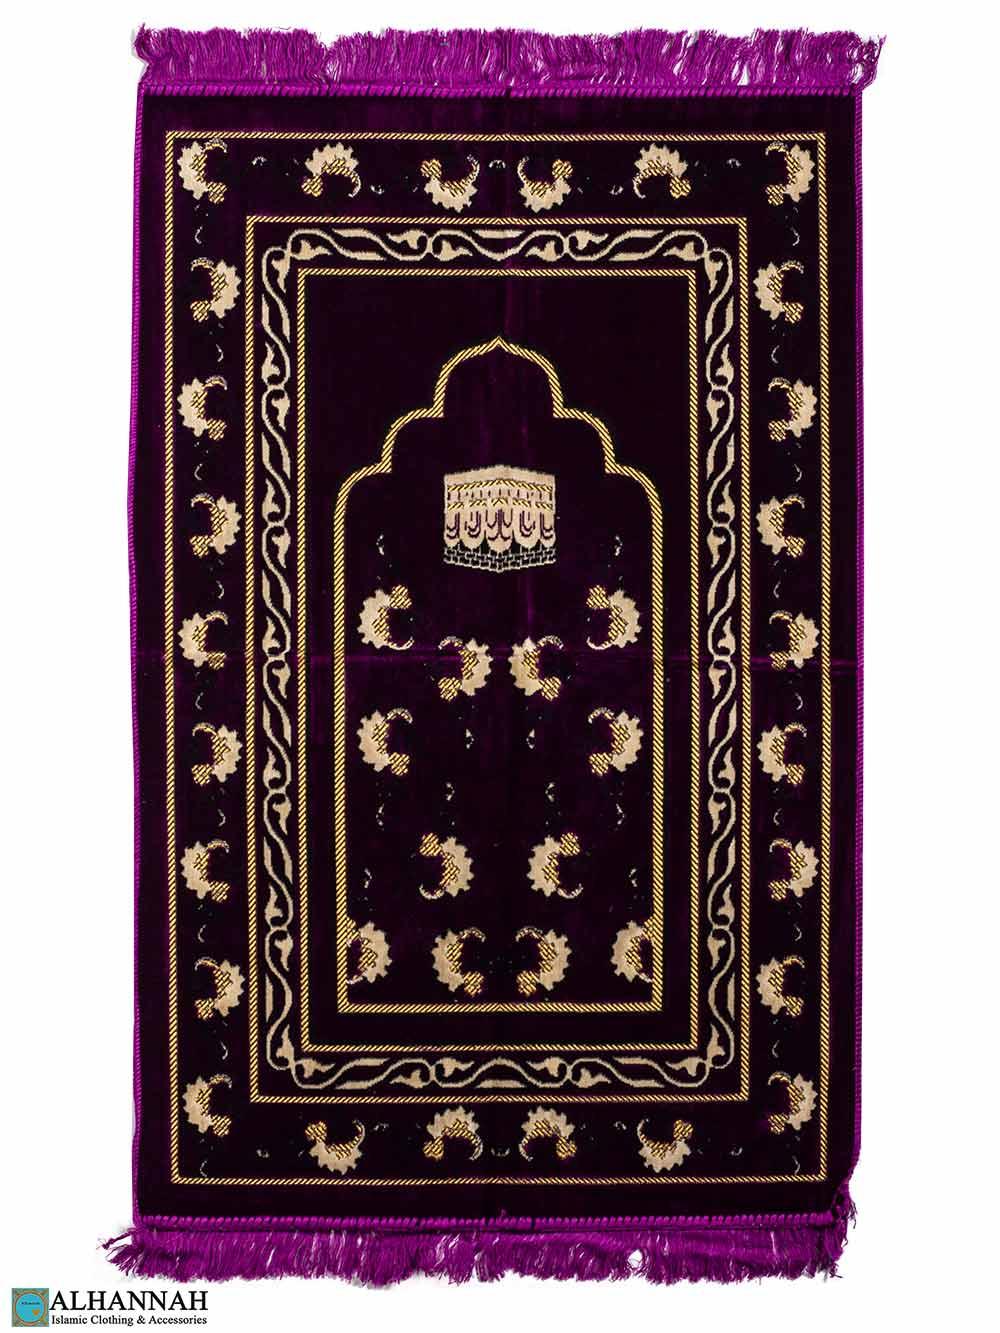 Turkish Prayer Rug Kaaba Motif - Grape